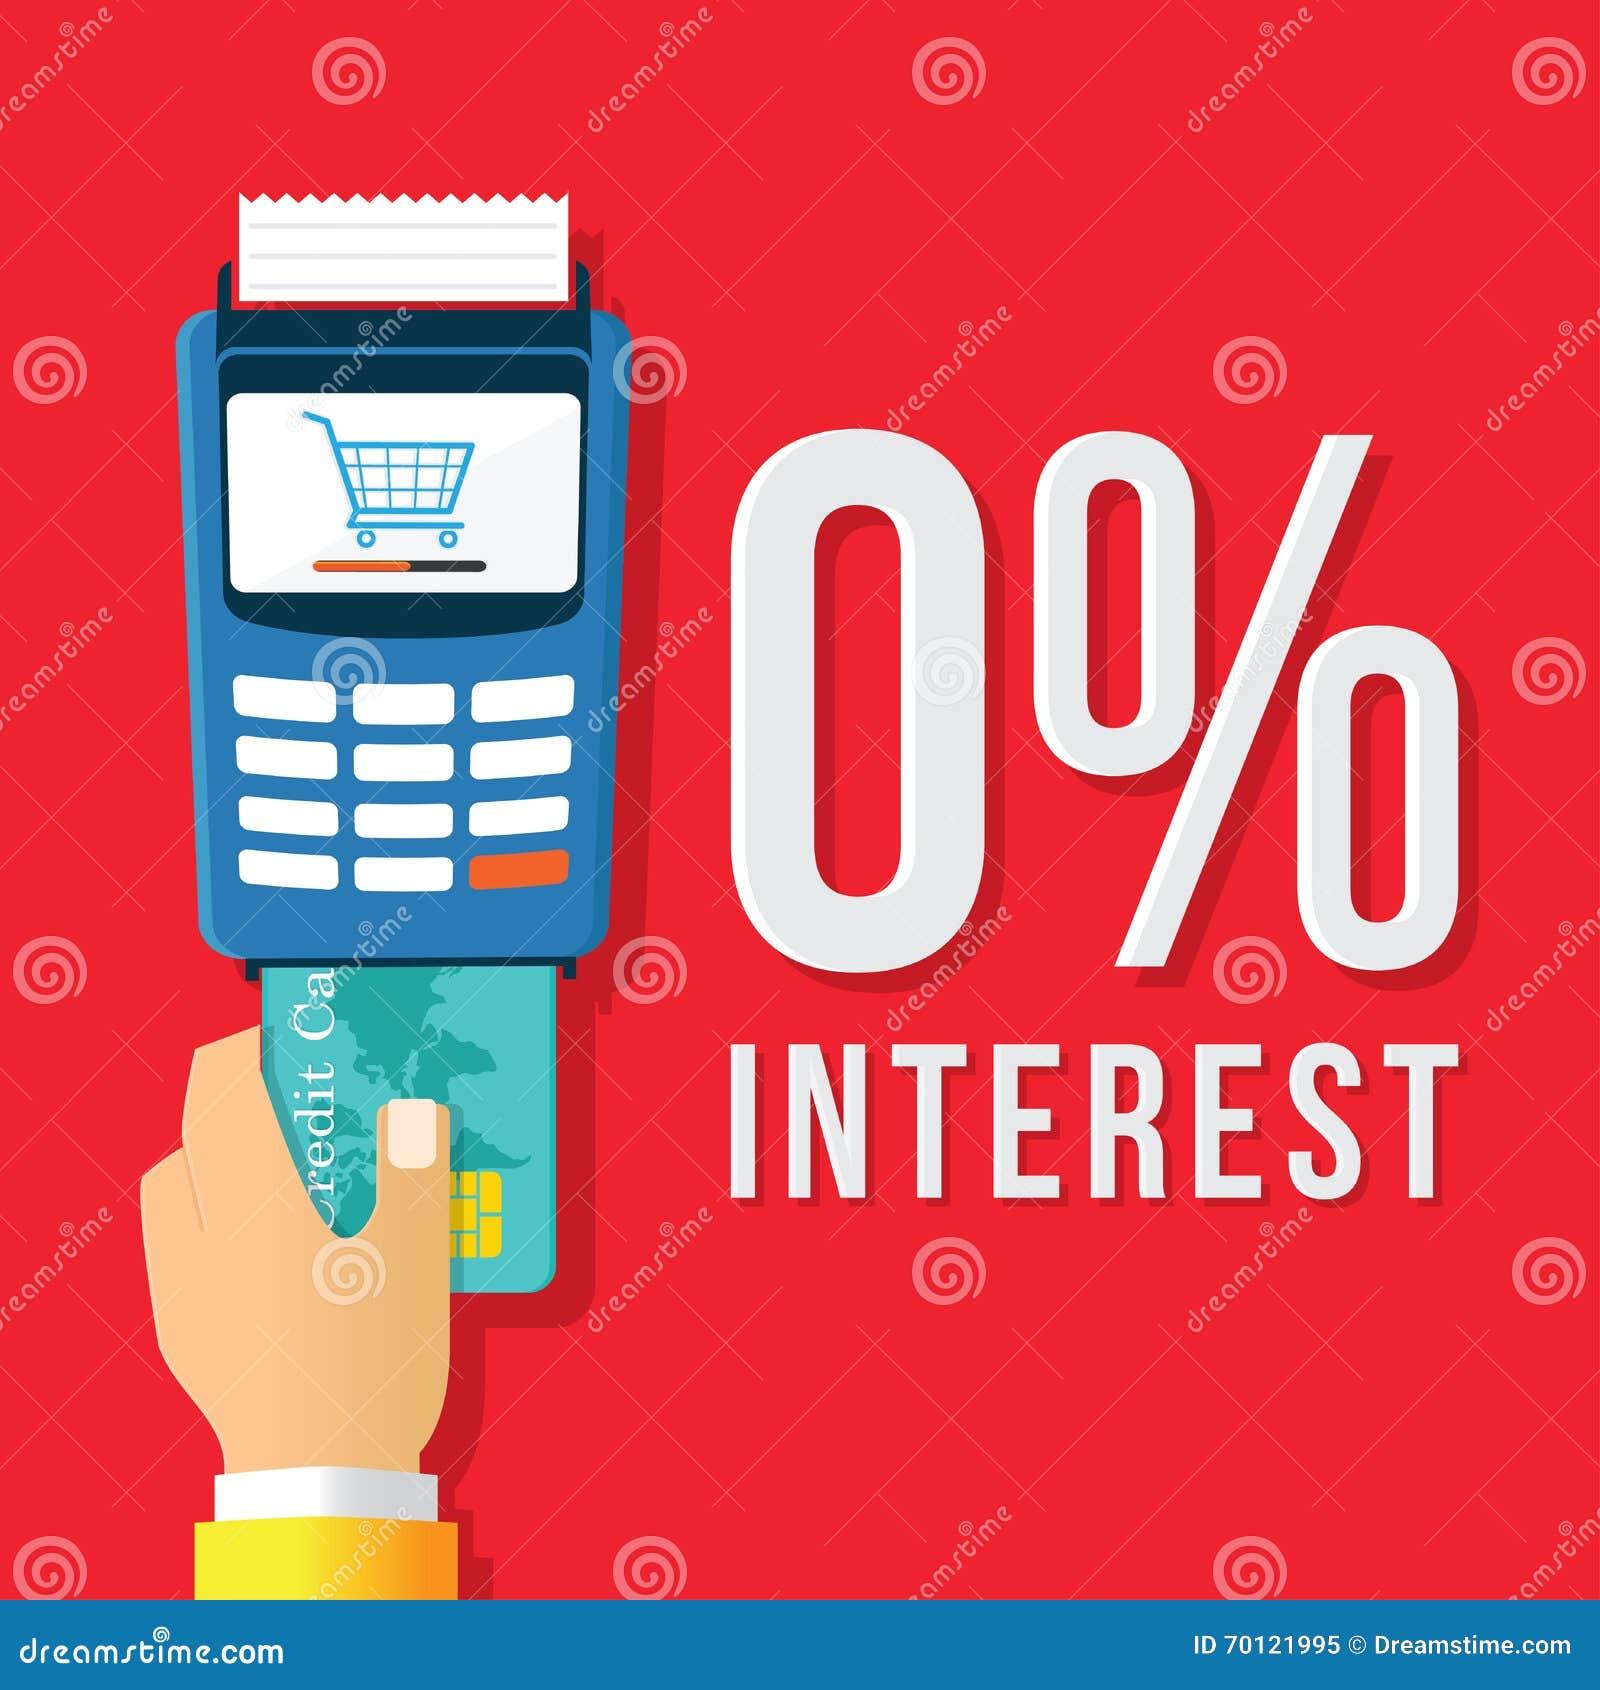 6 interest Credit payment stock vector. Illustration of bill